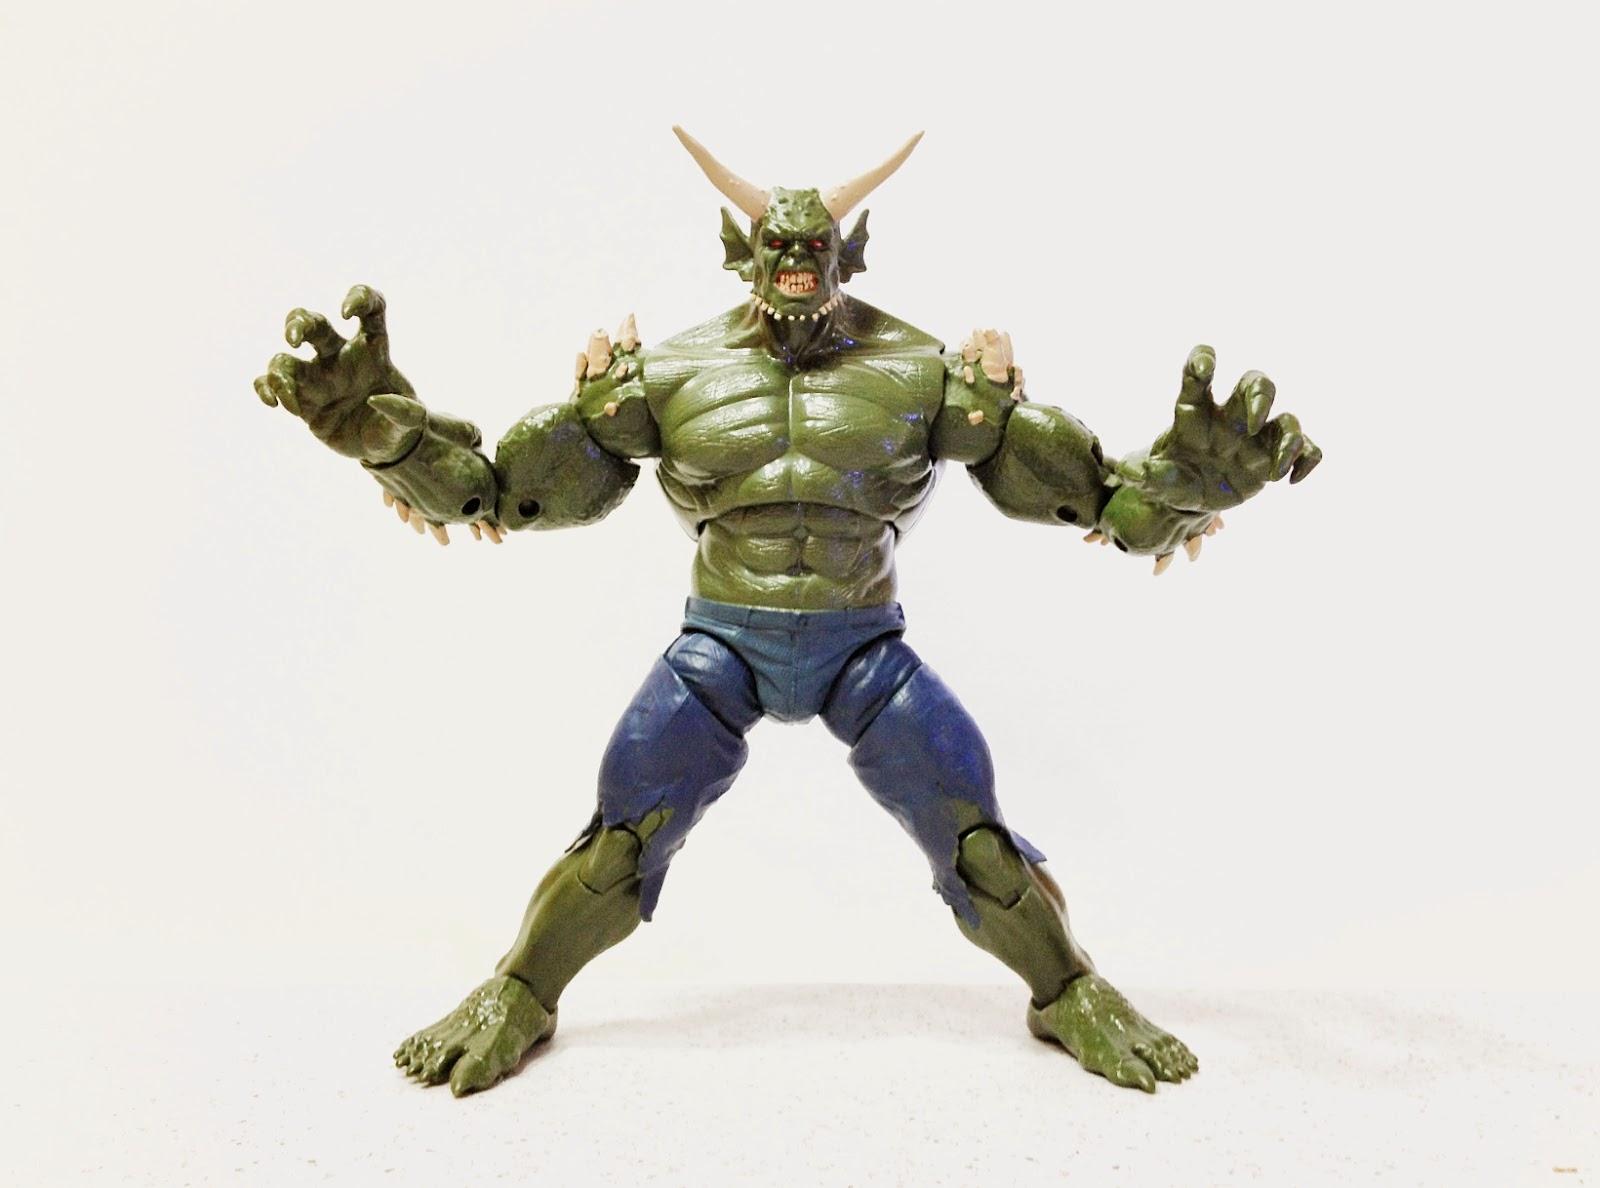 Ultimate Green Goblin Marvel Combo's Action Figure ...